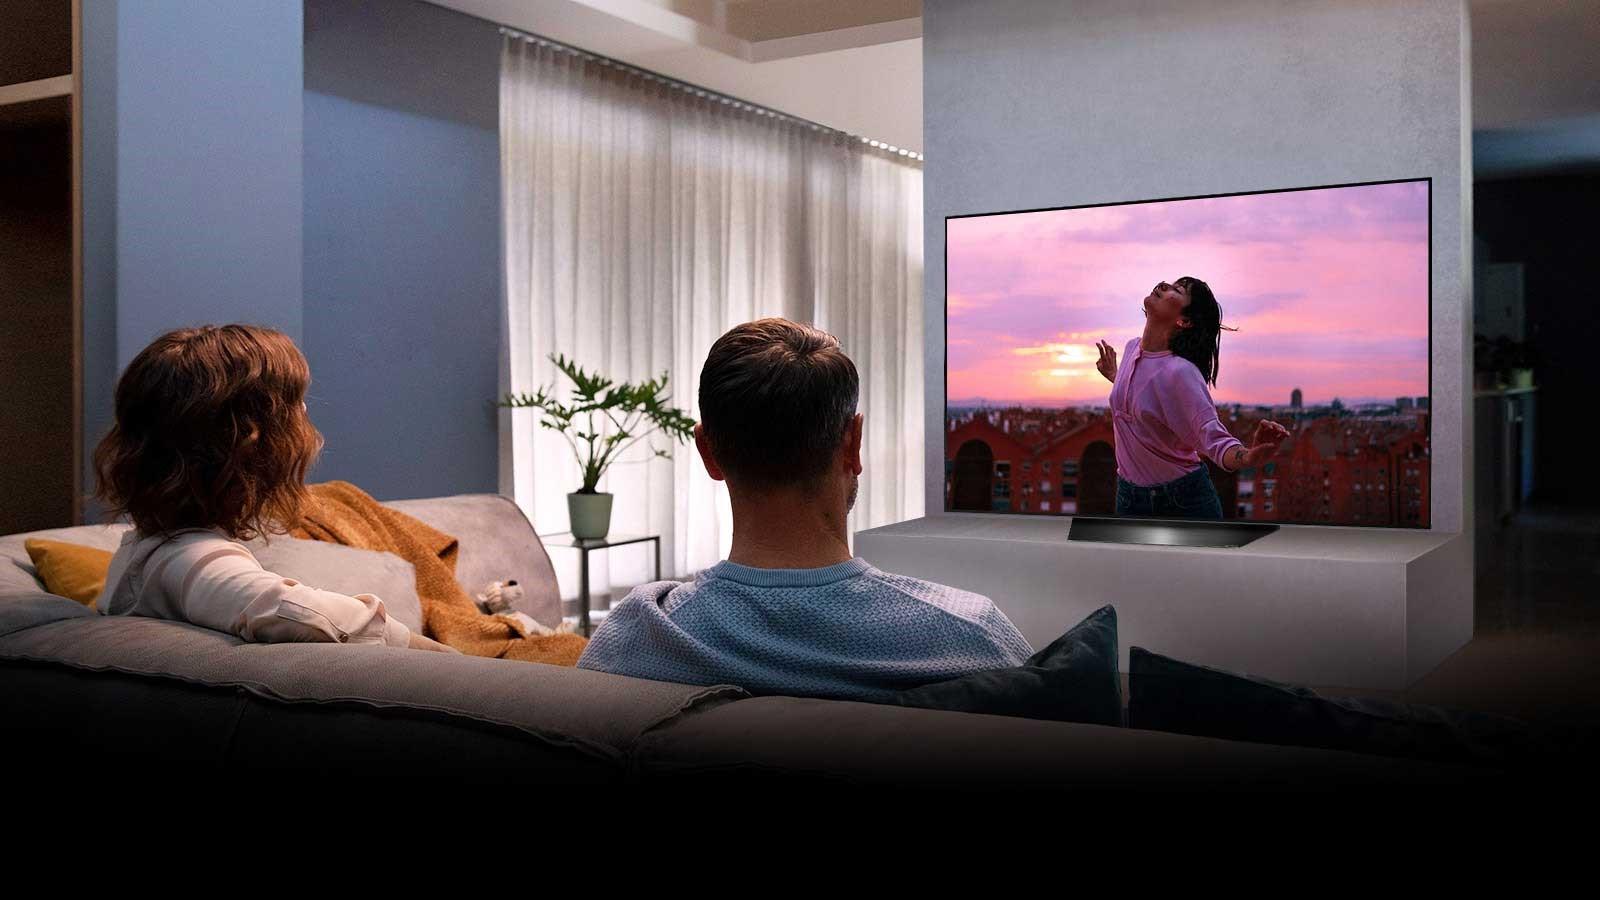 LG BX OLED miglior TV OLED economico